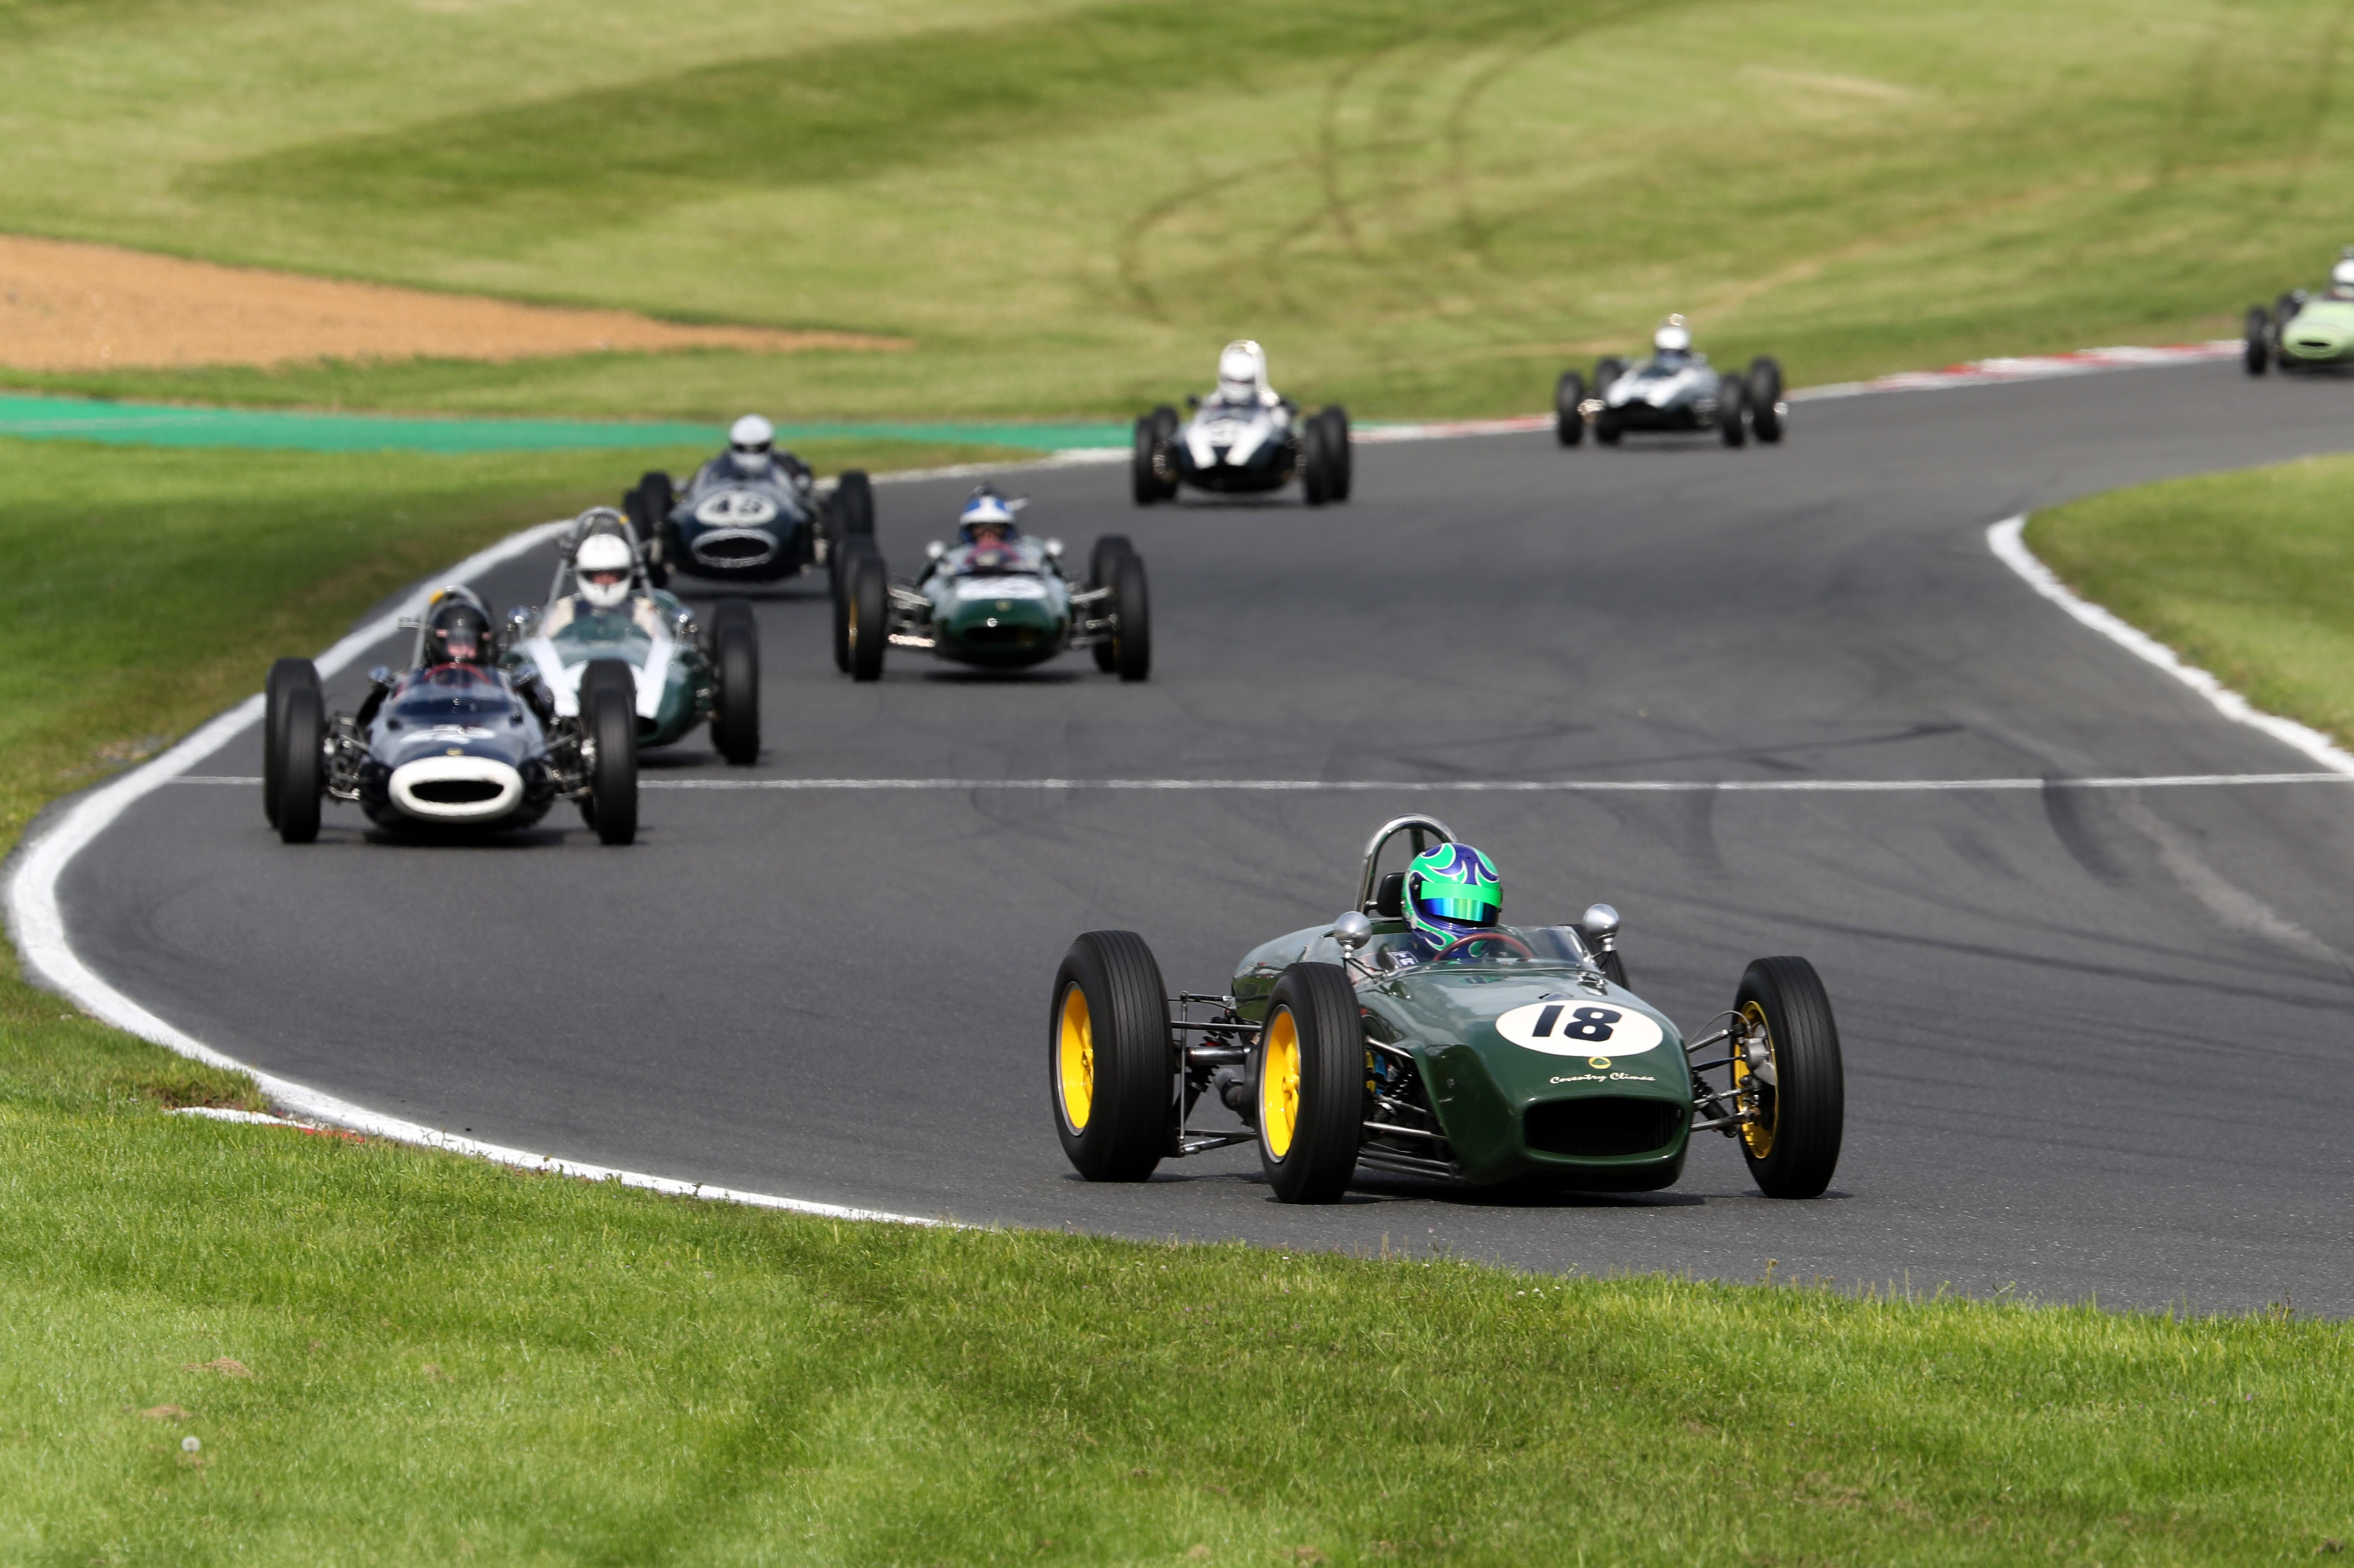 Sam Wilson (Lotus 18), HGPCA, Brands Hatch 2021